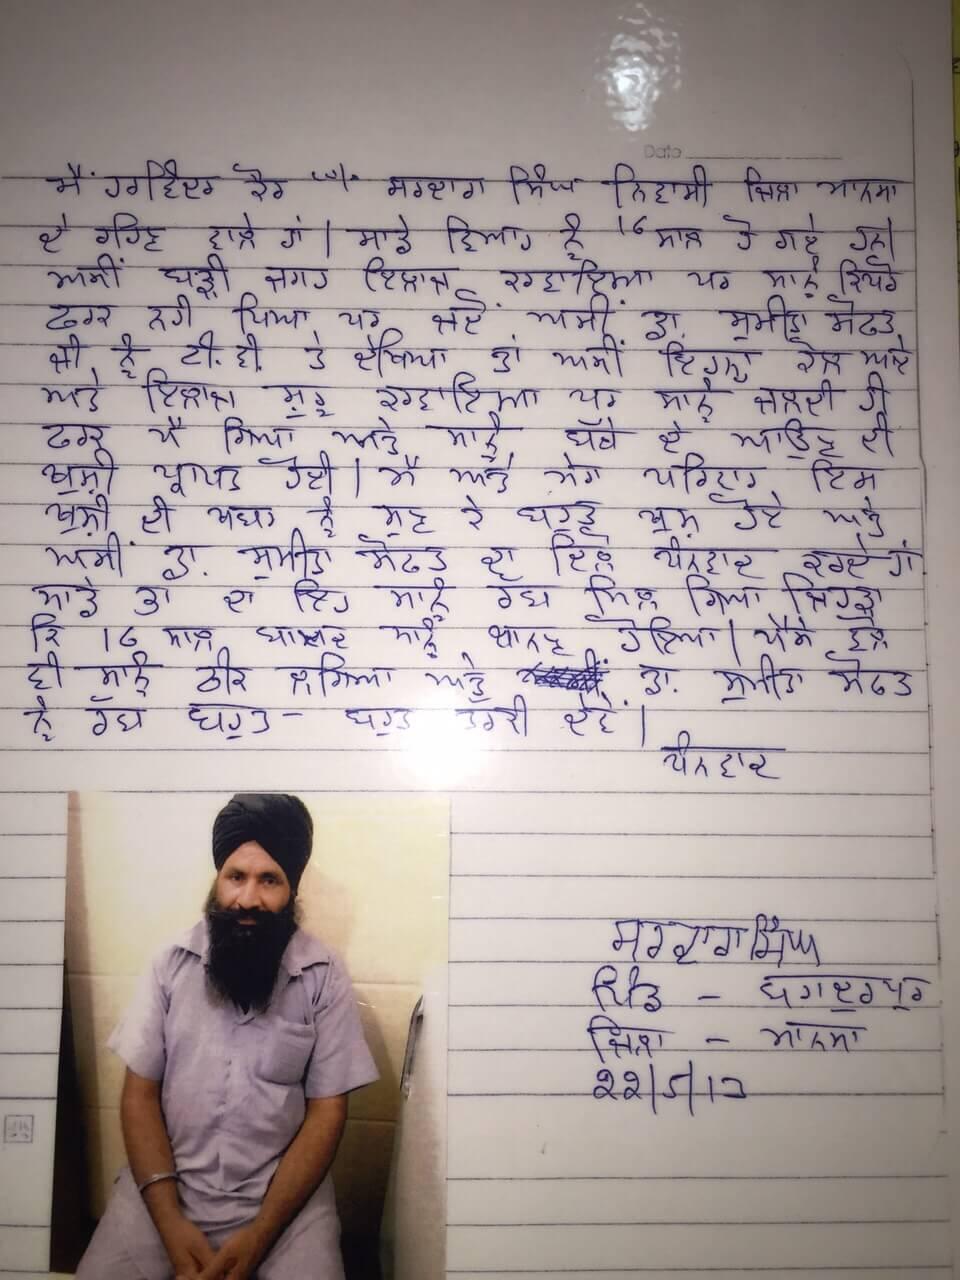 Sardara-Singh-Harwinder-Kaur